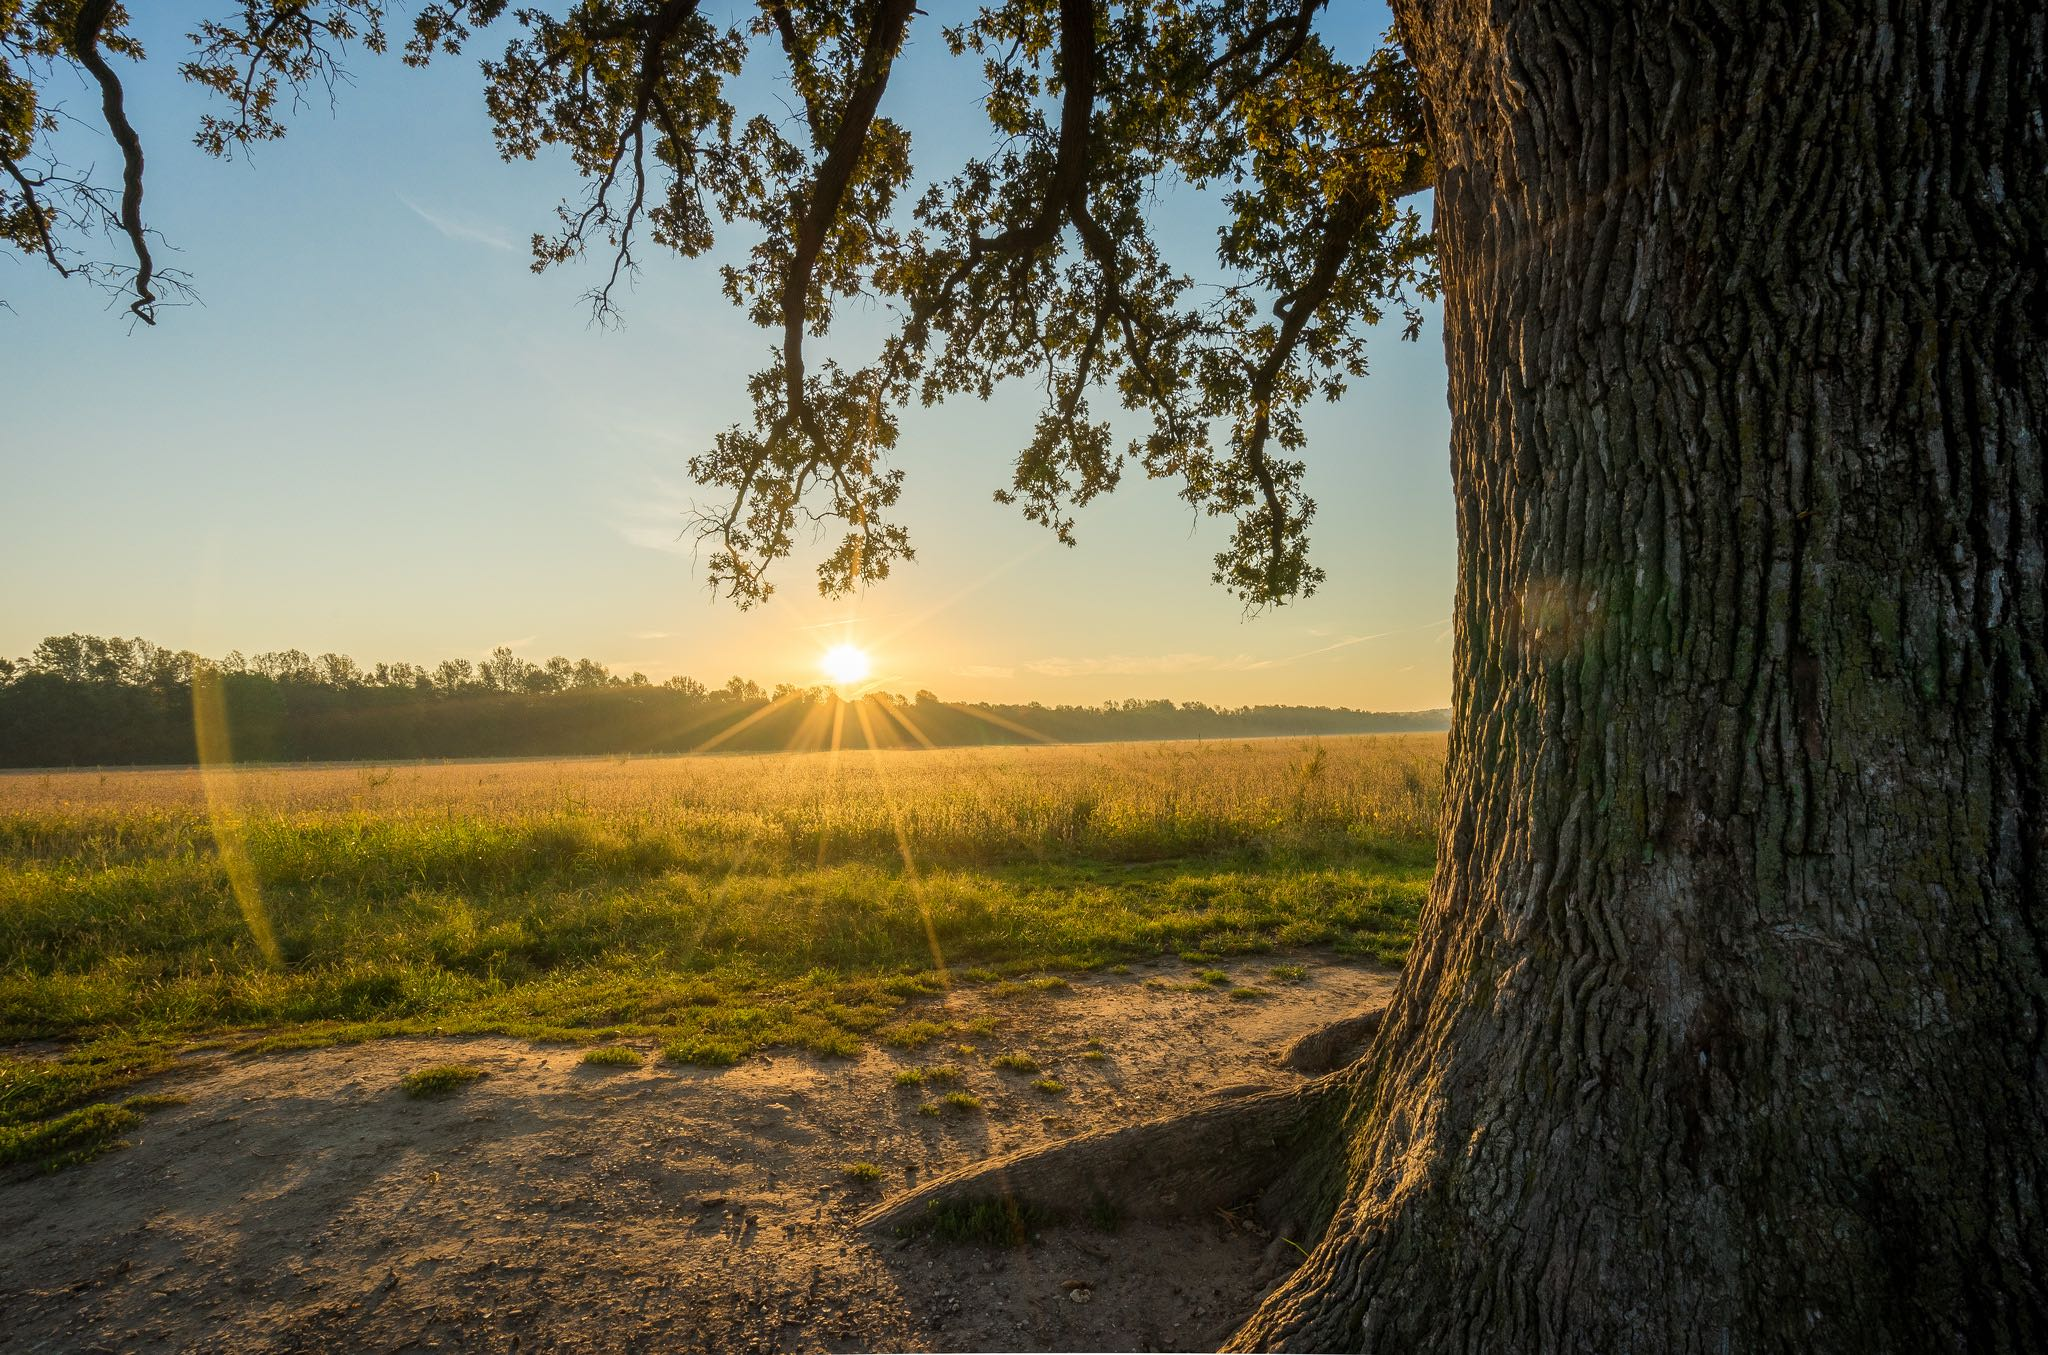 Burr Oak background image